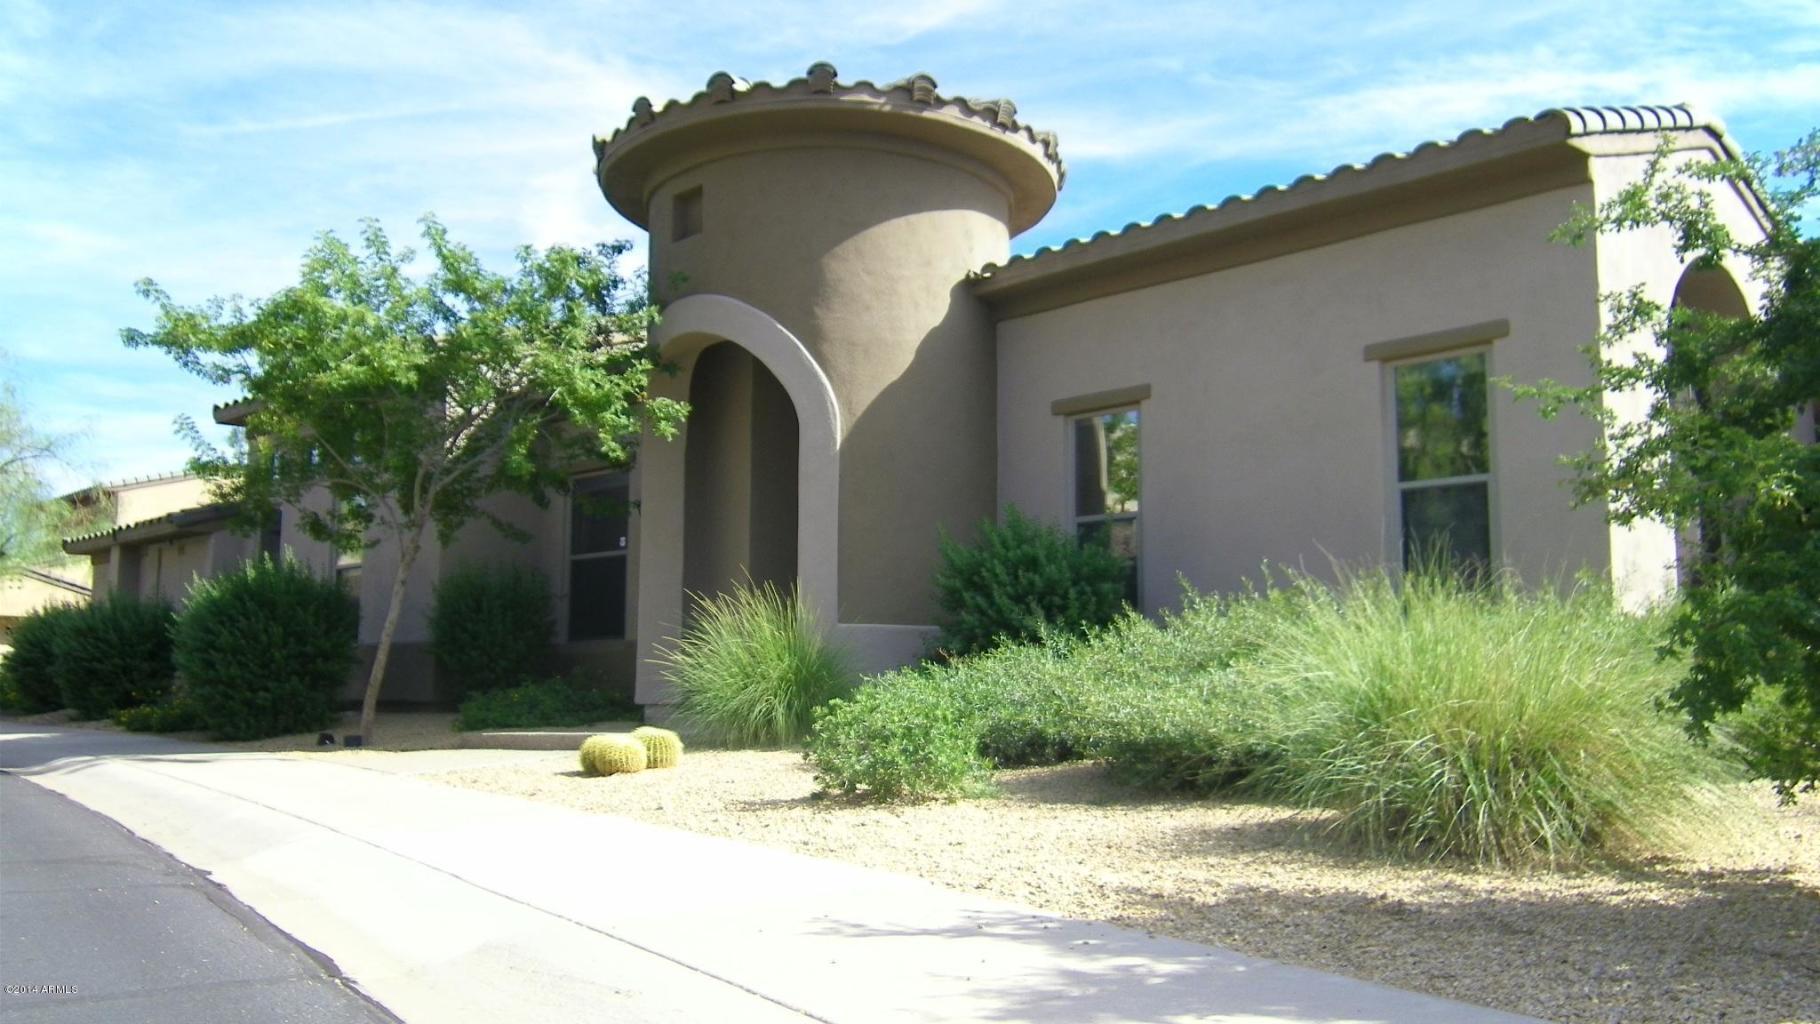 20802 N Grayhawk Dr 1149, Scottsdale | $405,000